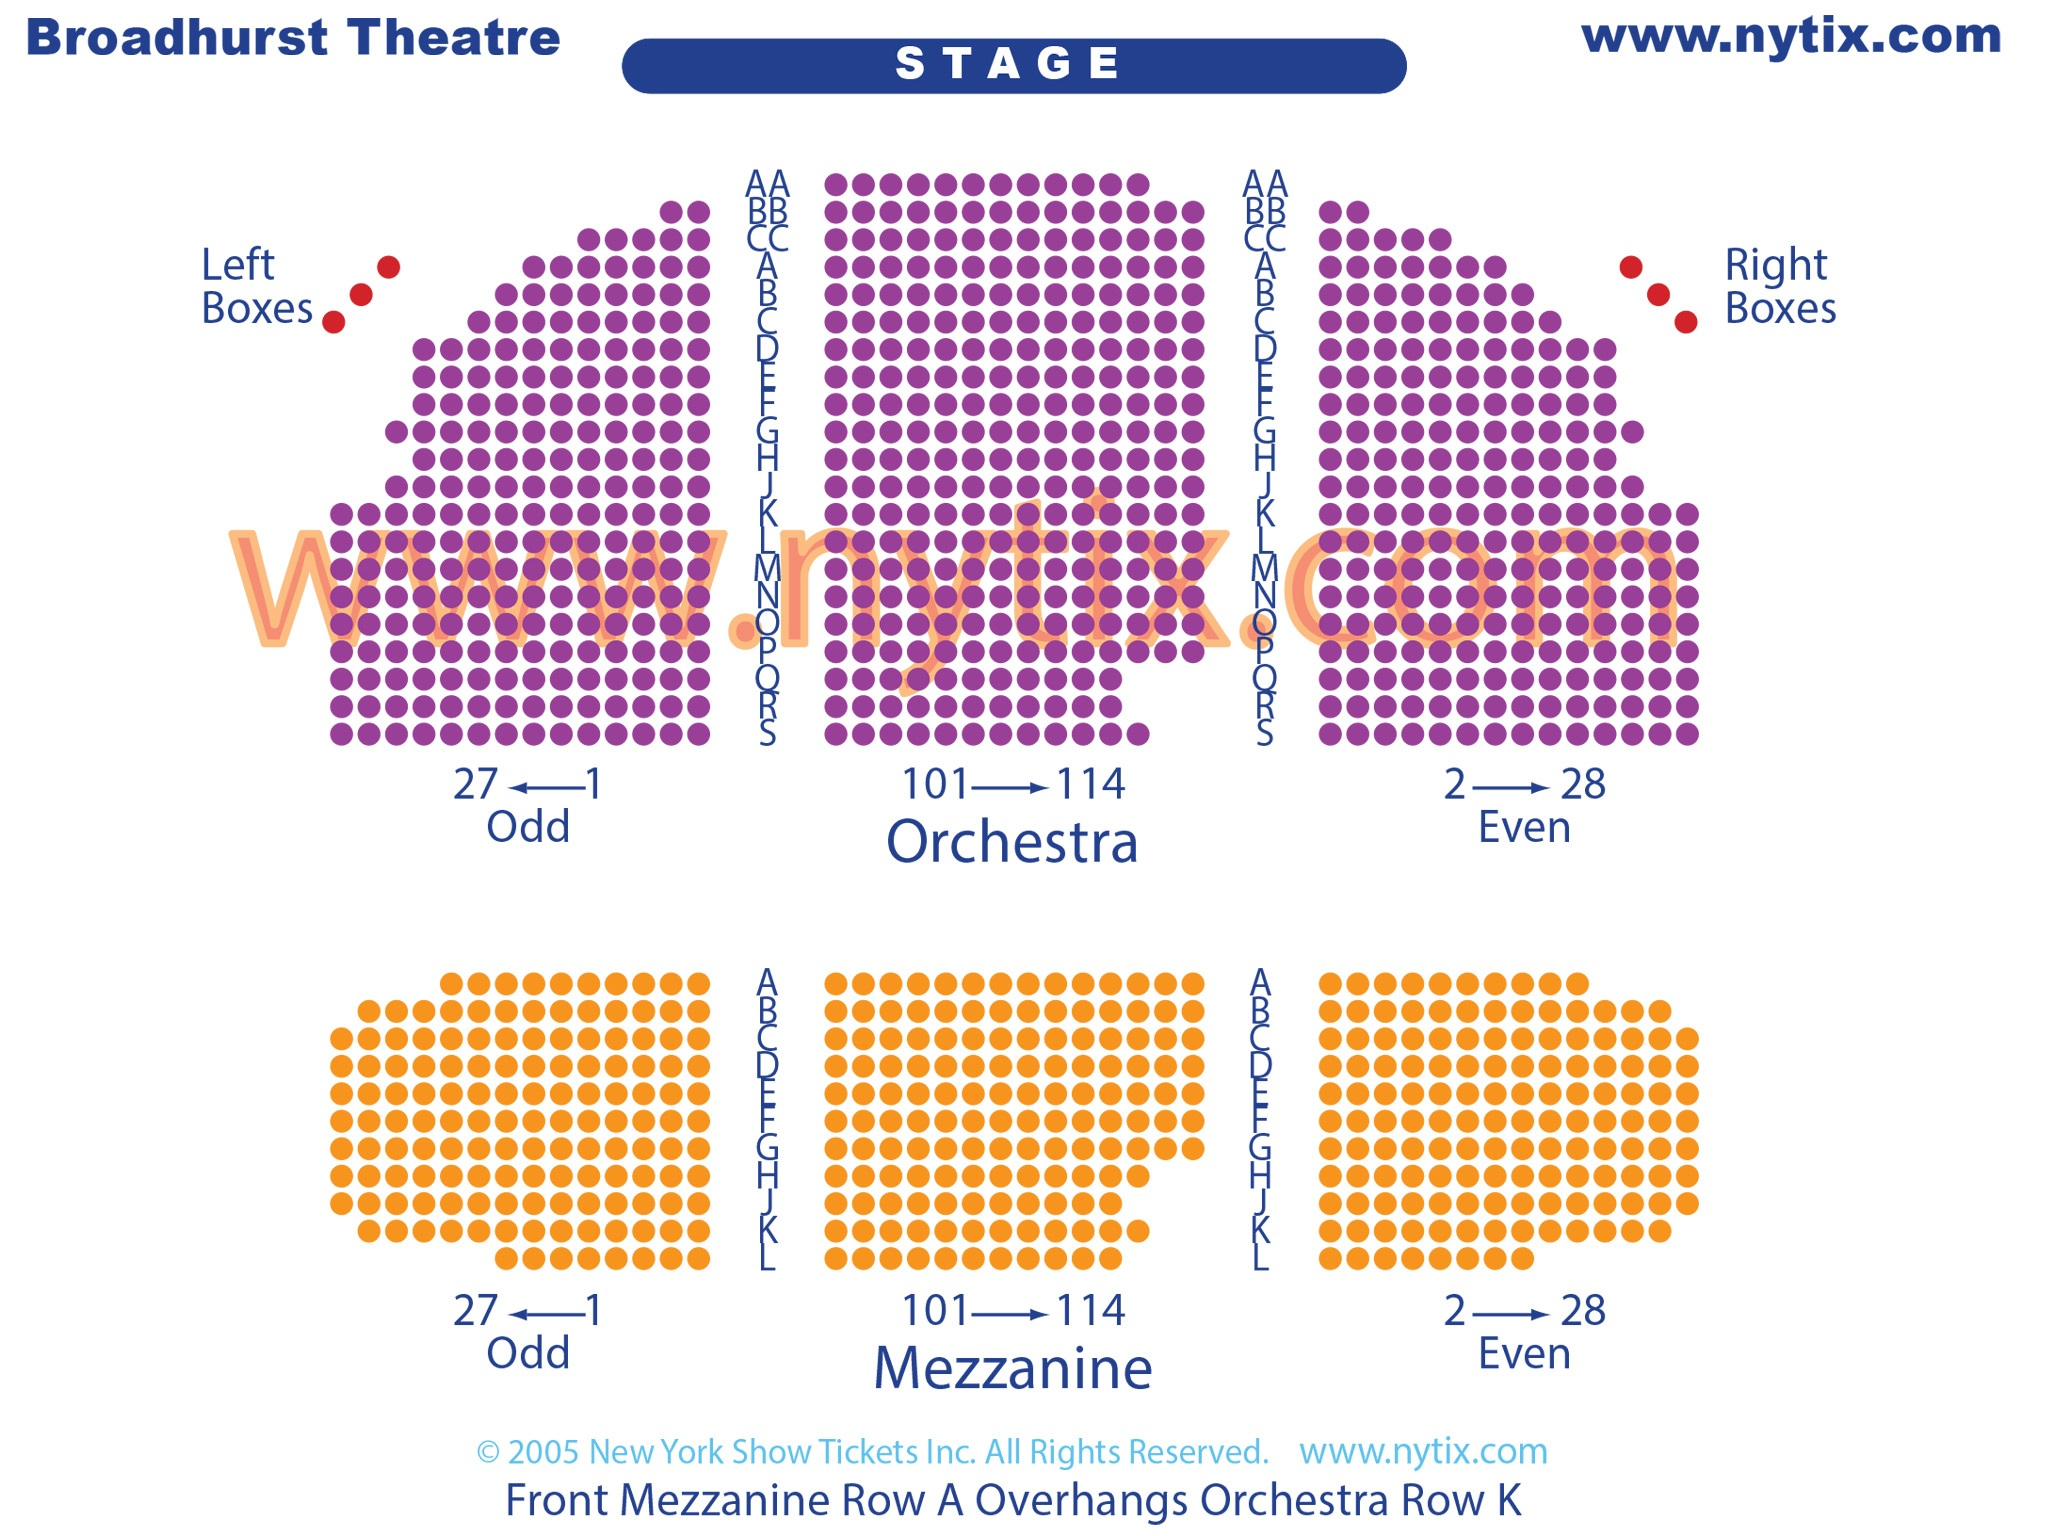 Broadhurst Theatre Seating Chart